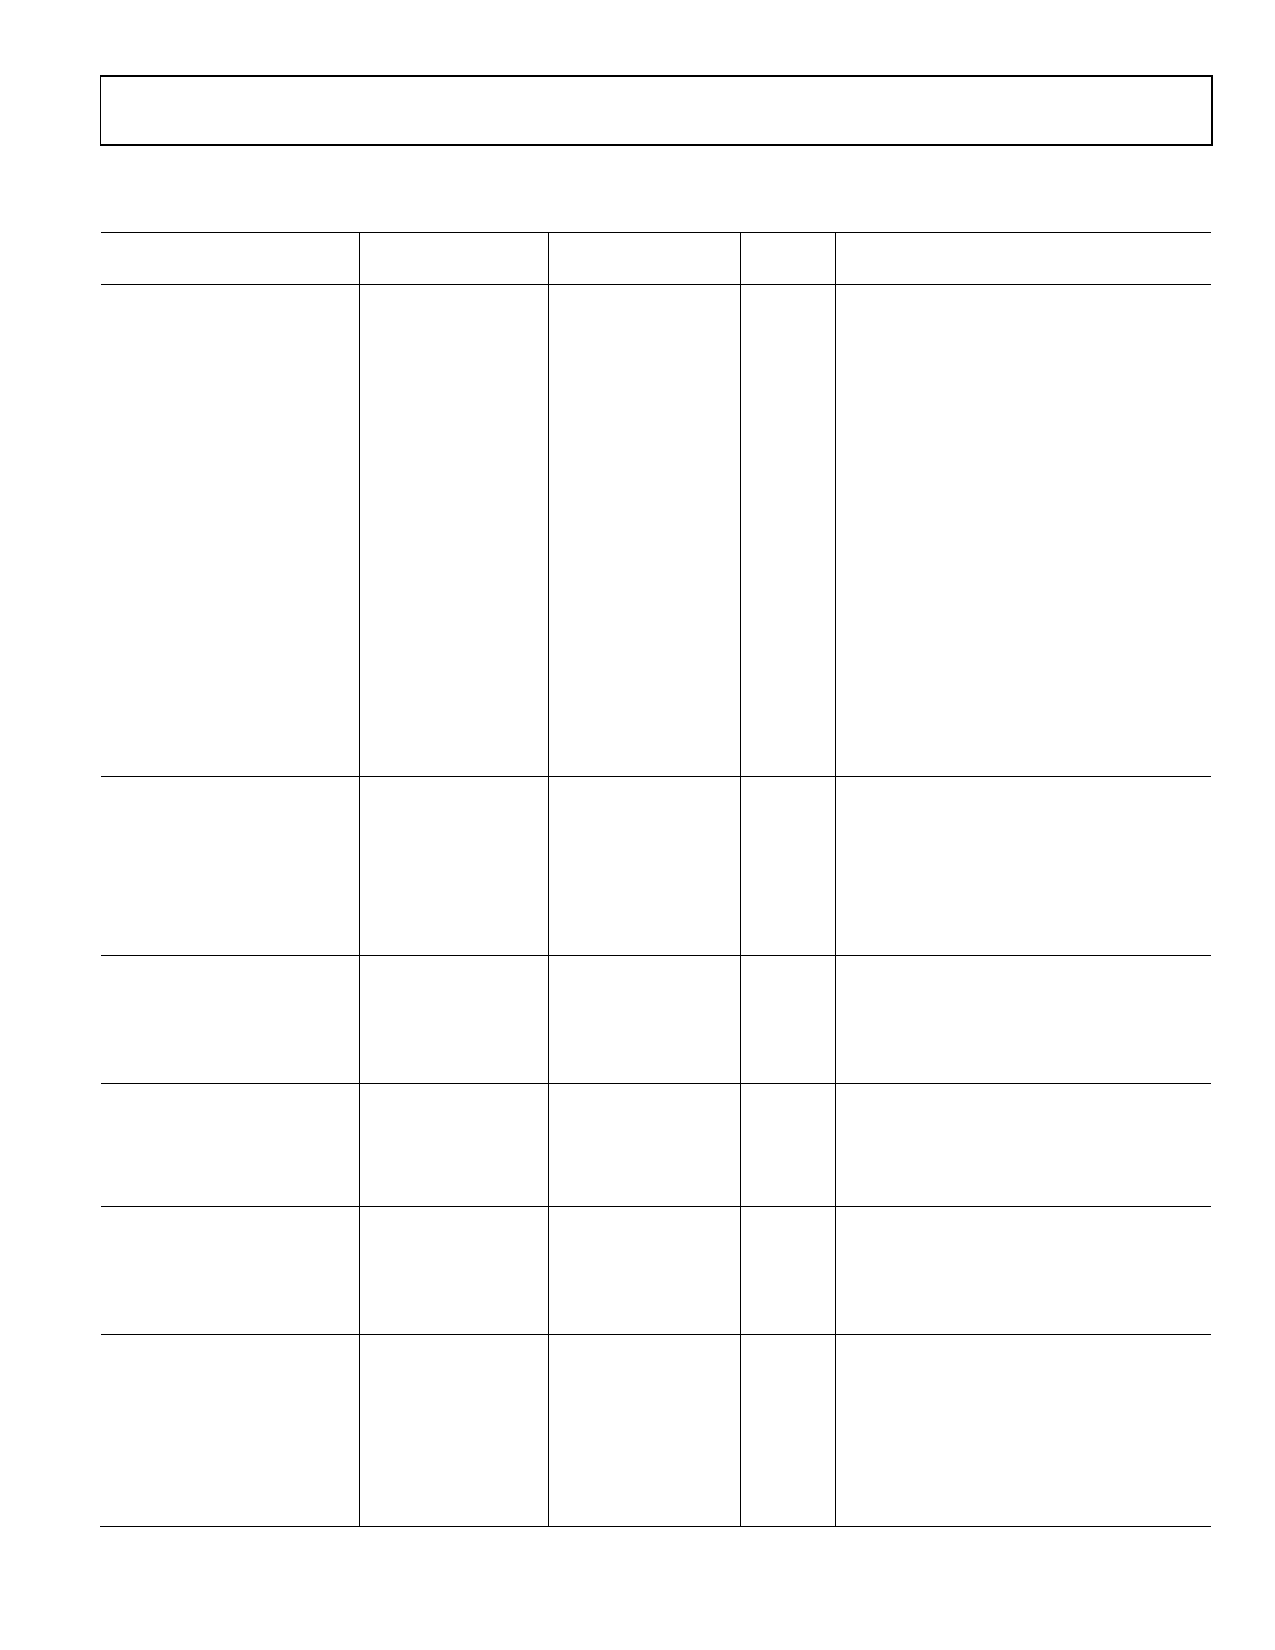 AD5666 pdf, arduino